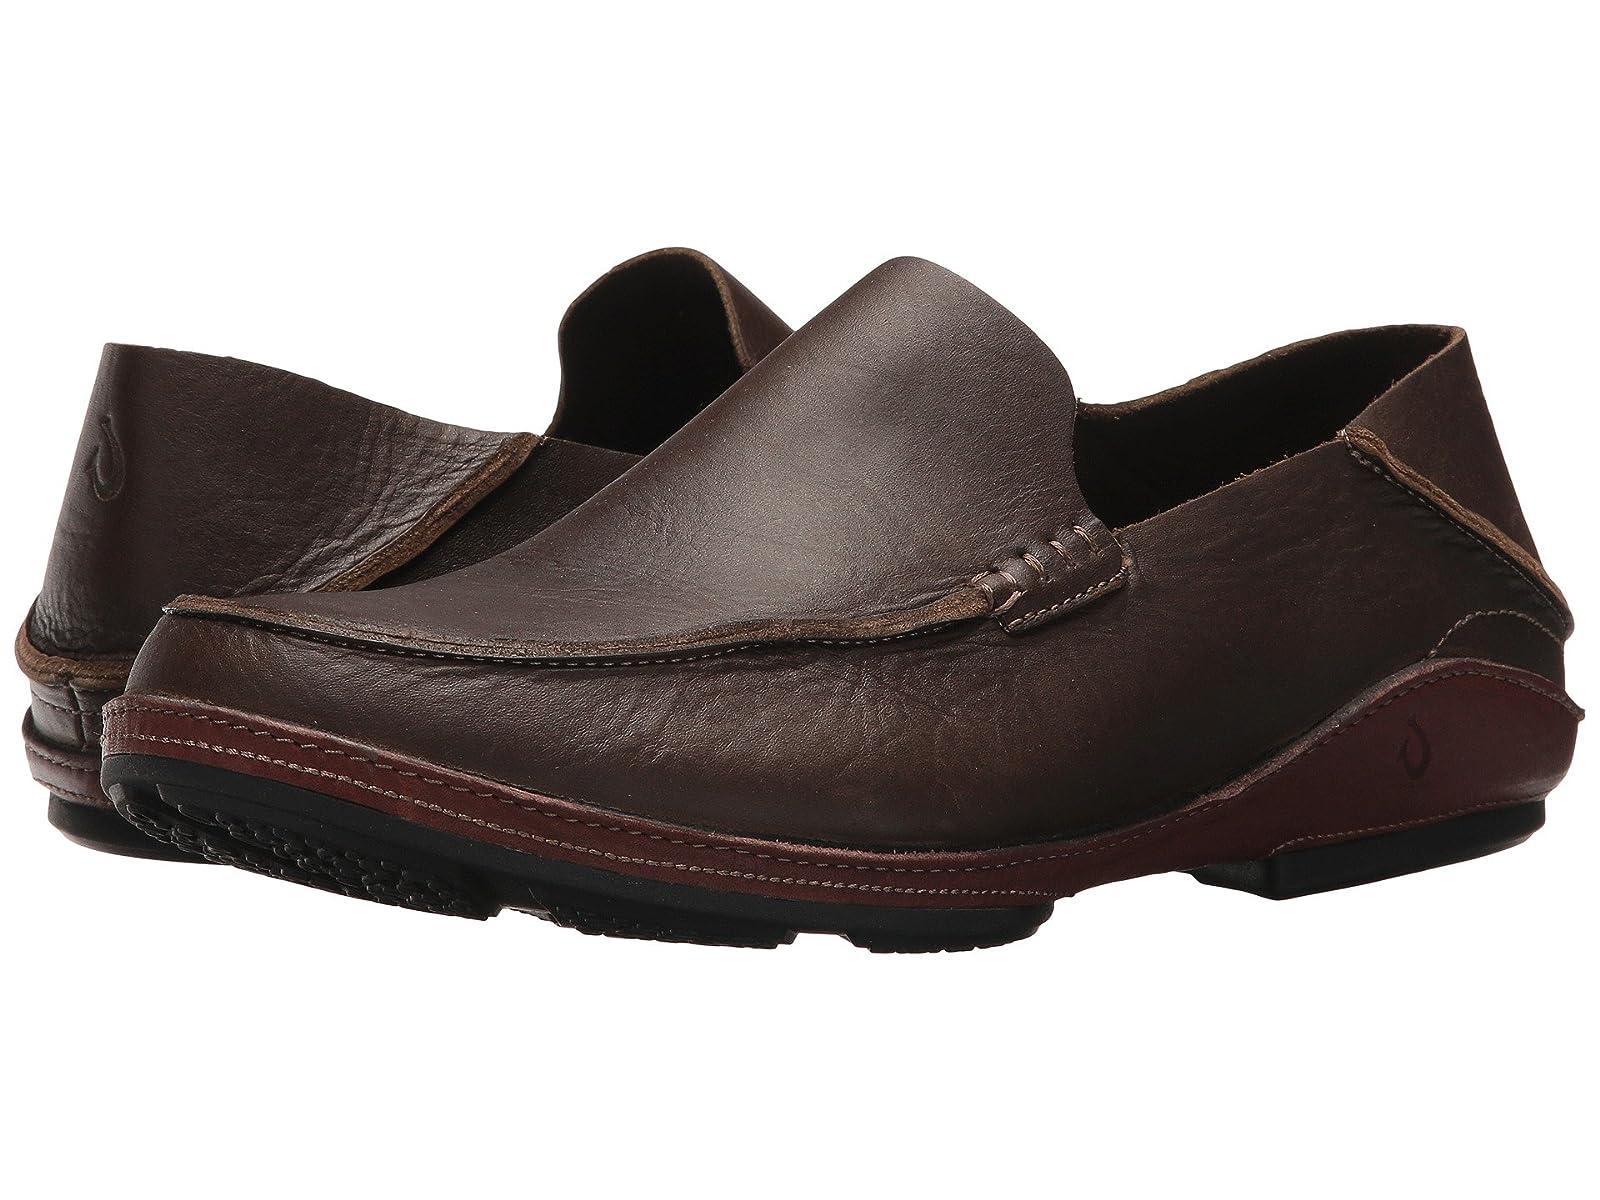 OluKai Ni'oAtmospheric grades have affordable shoes